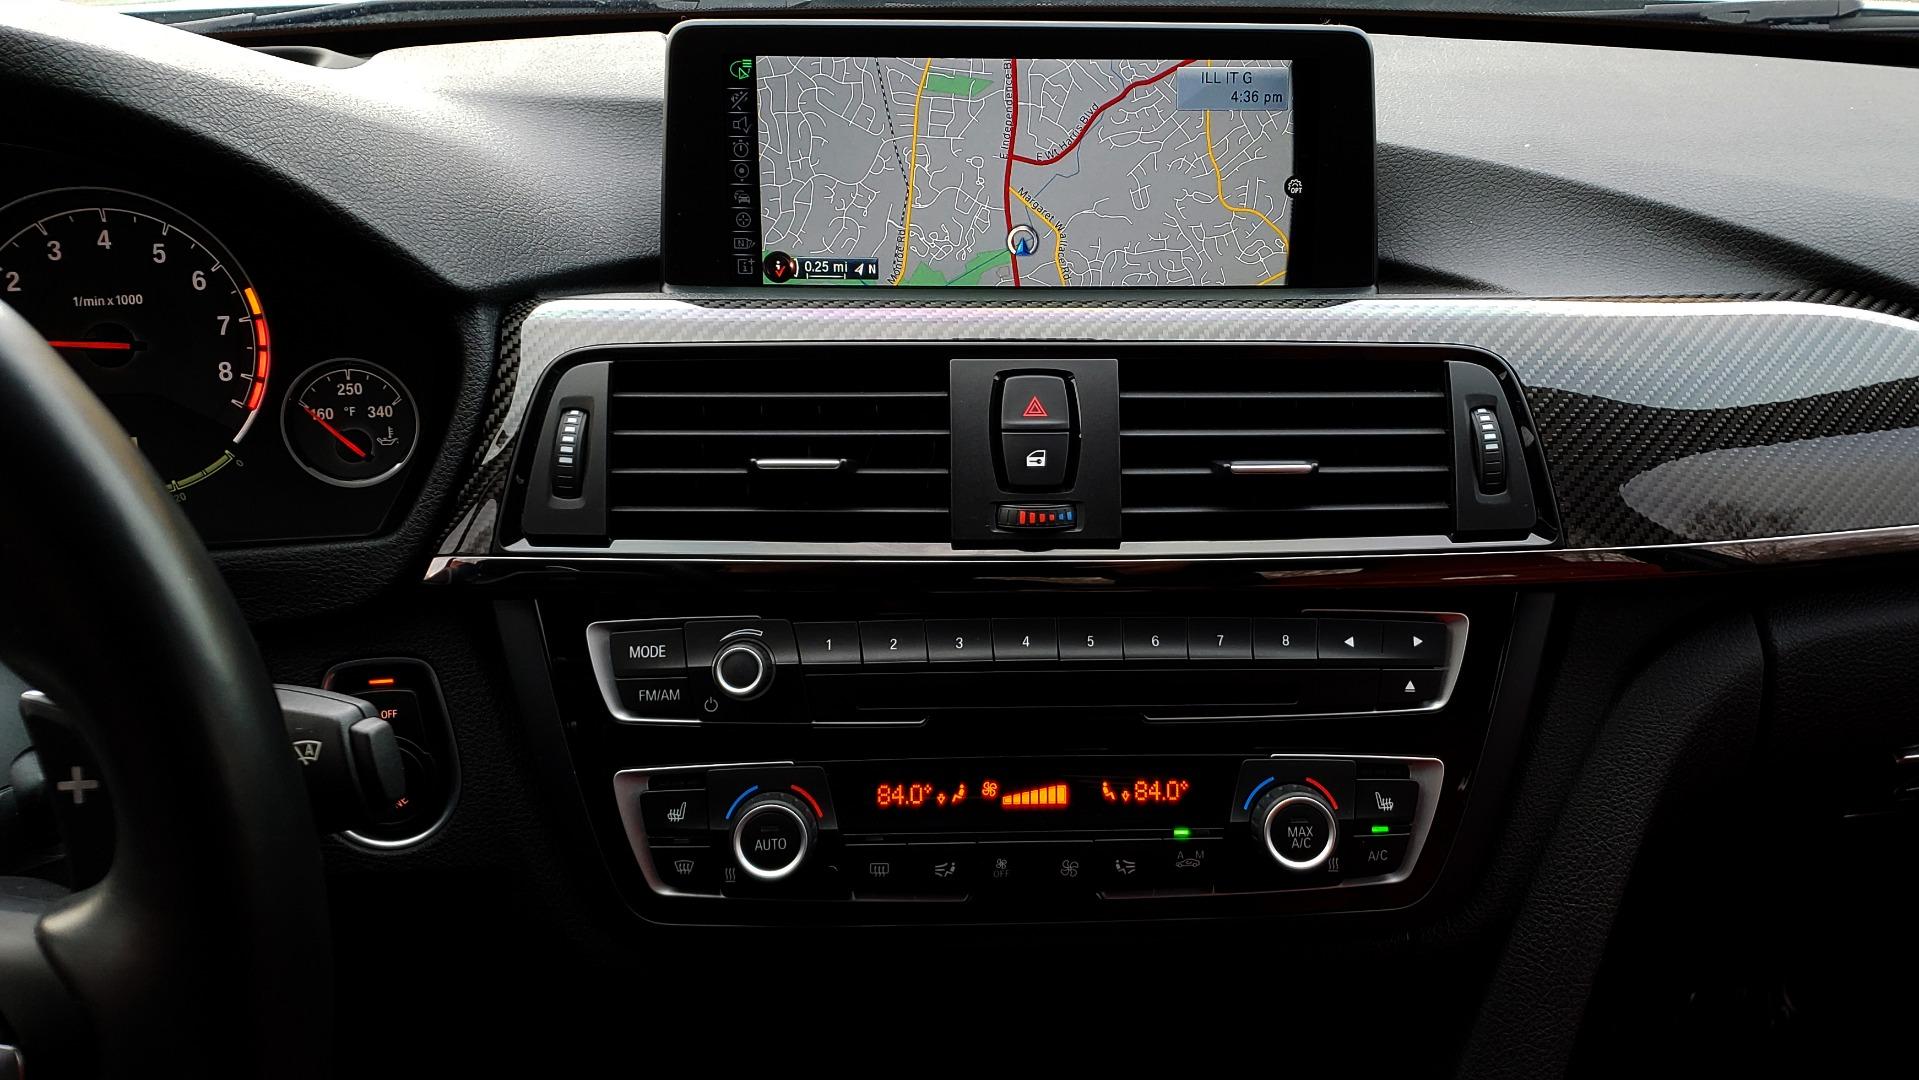 Used 2015 BMW M3 EXECUTIVE PKG / NAV / CAMERA / HUD / CARBON FIBER ROOF for sale Sold at Formula Imports in Charlotte NC 28227 57